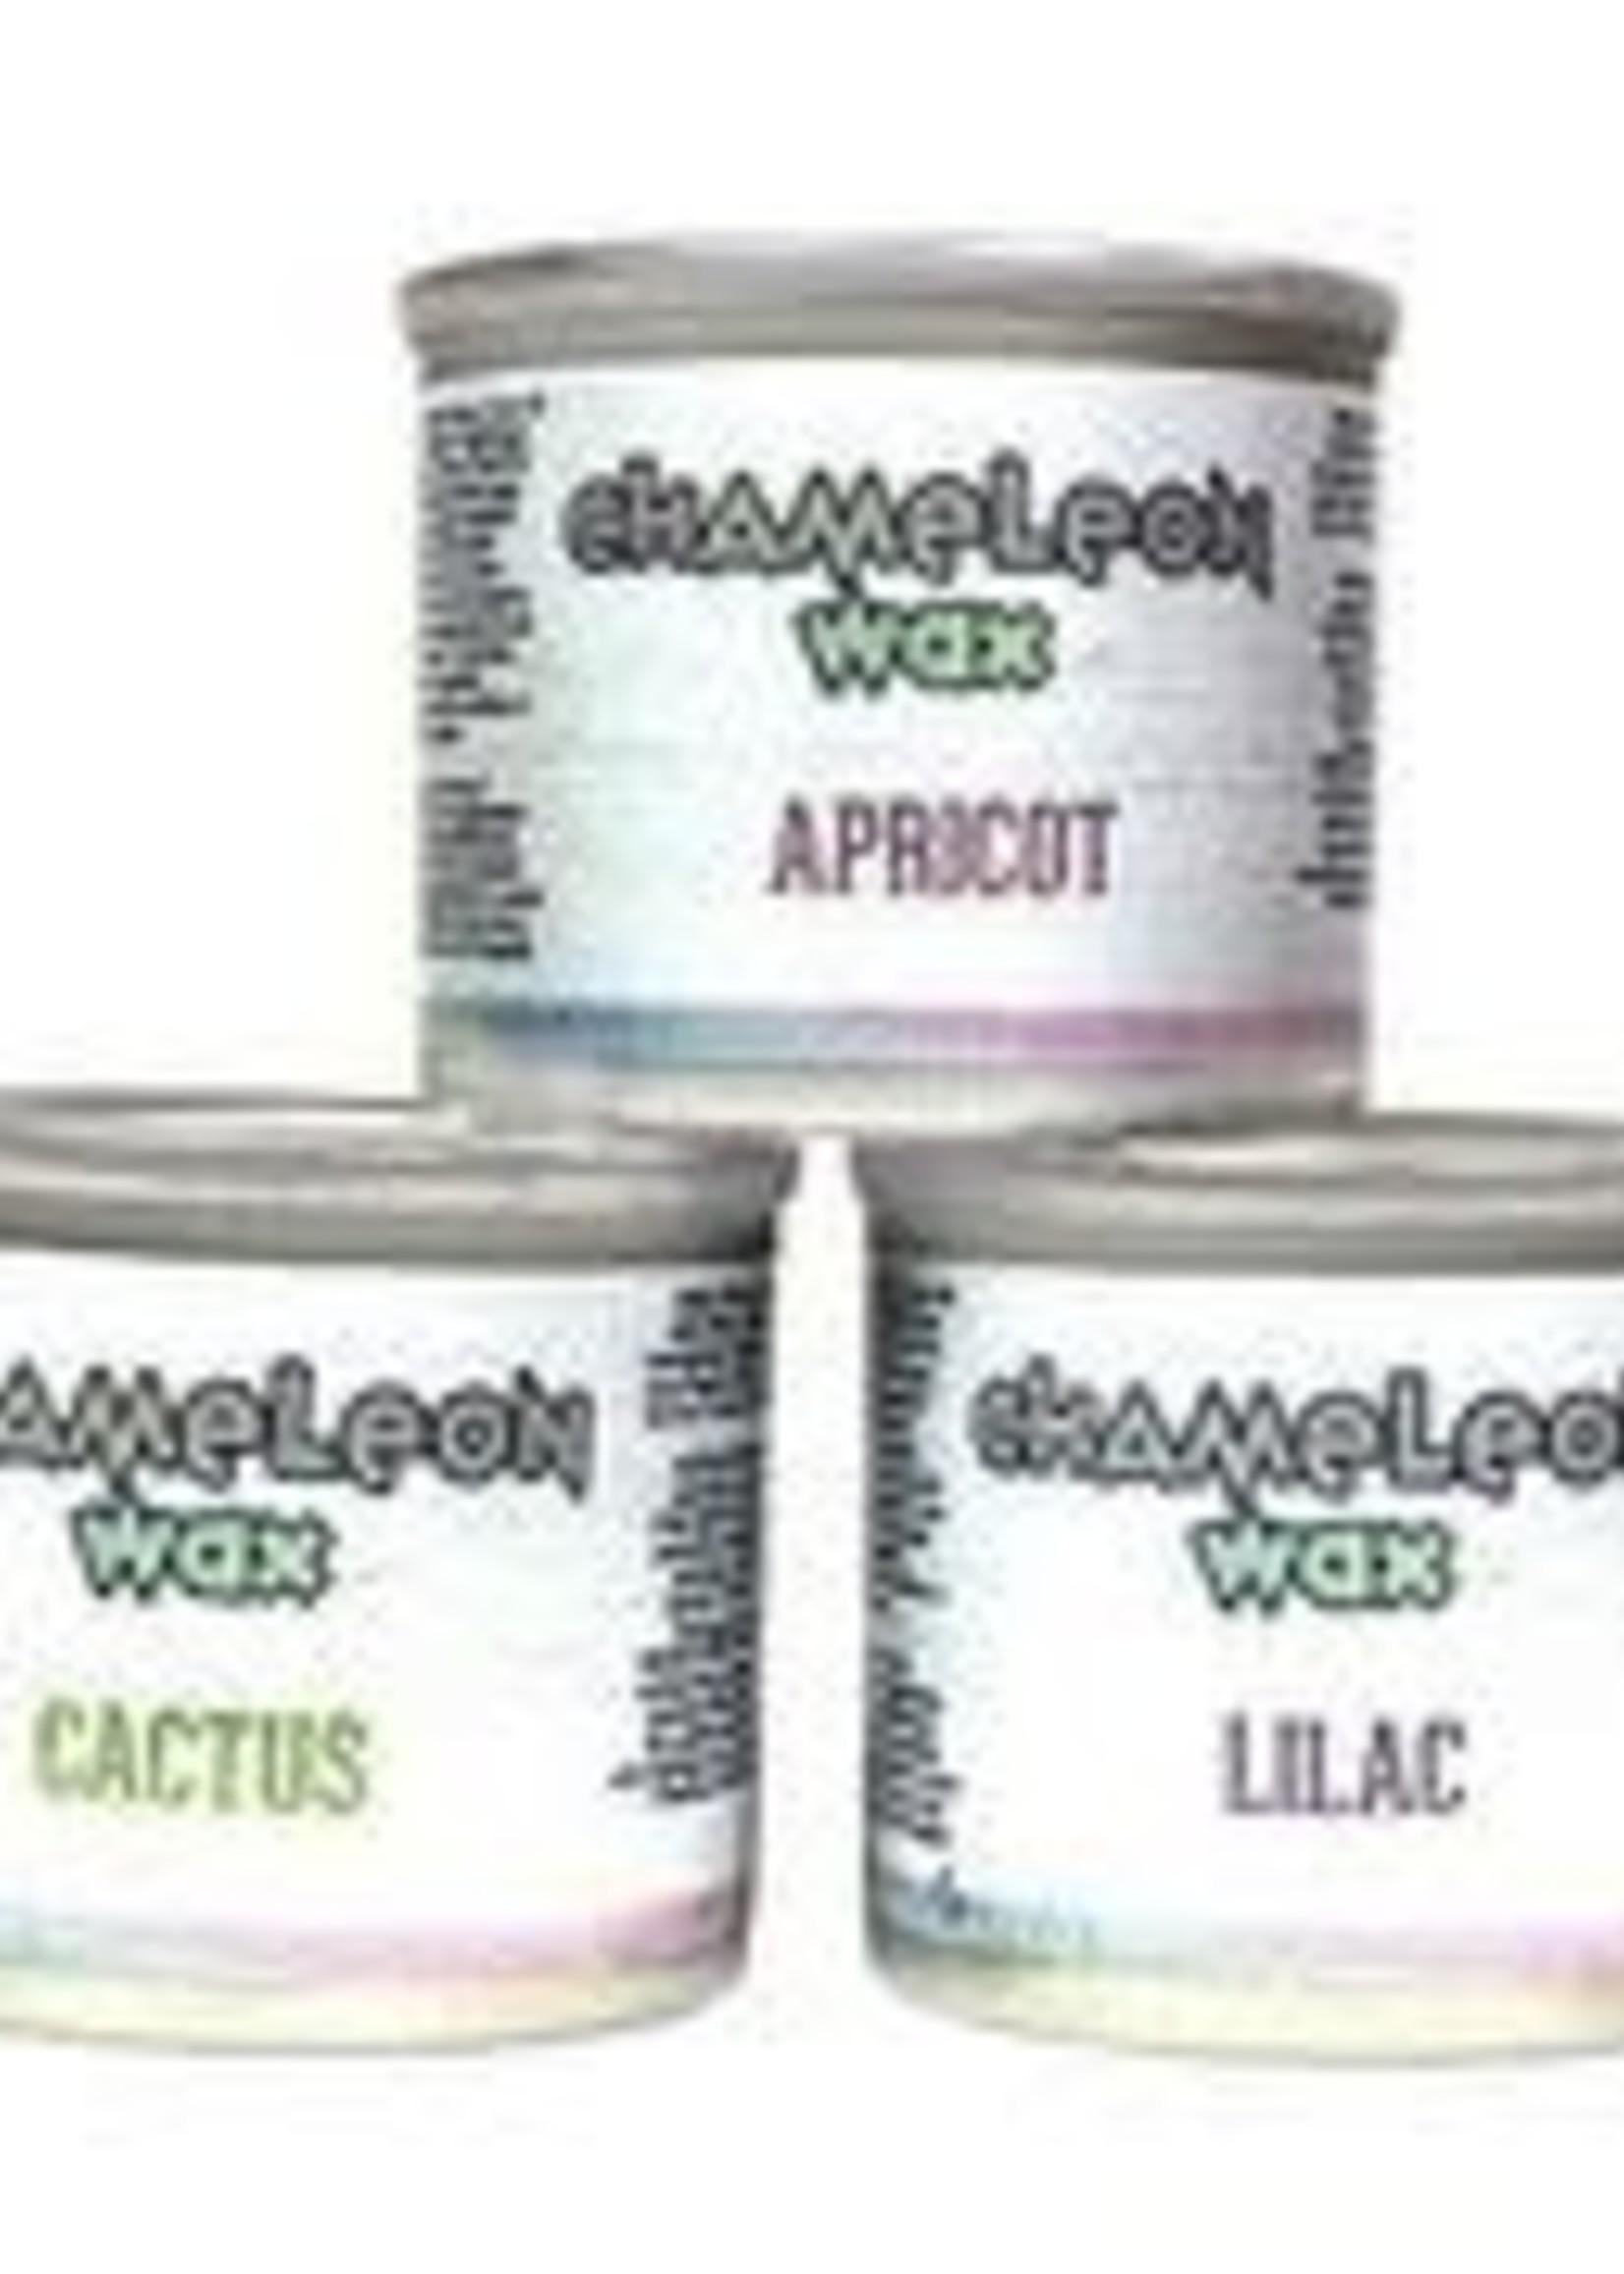 Chameleon Wax Lilac 40 ml